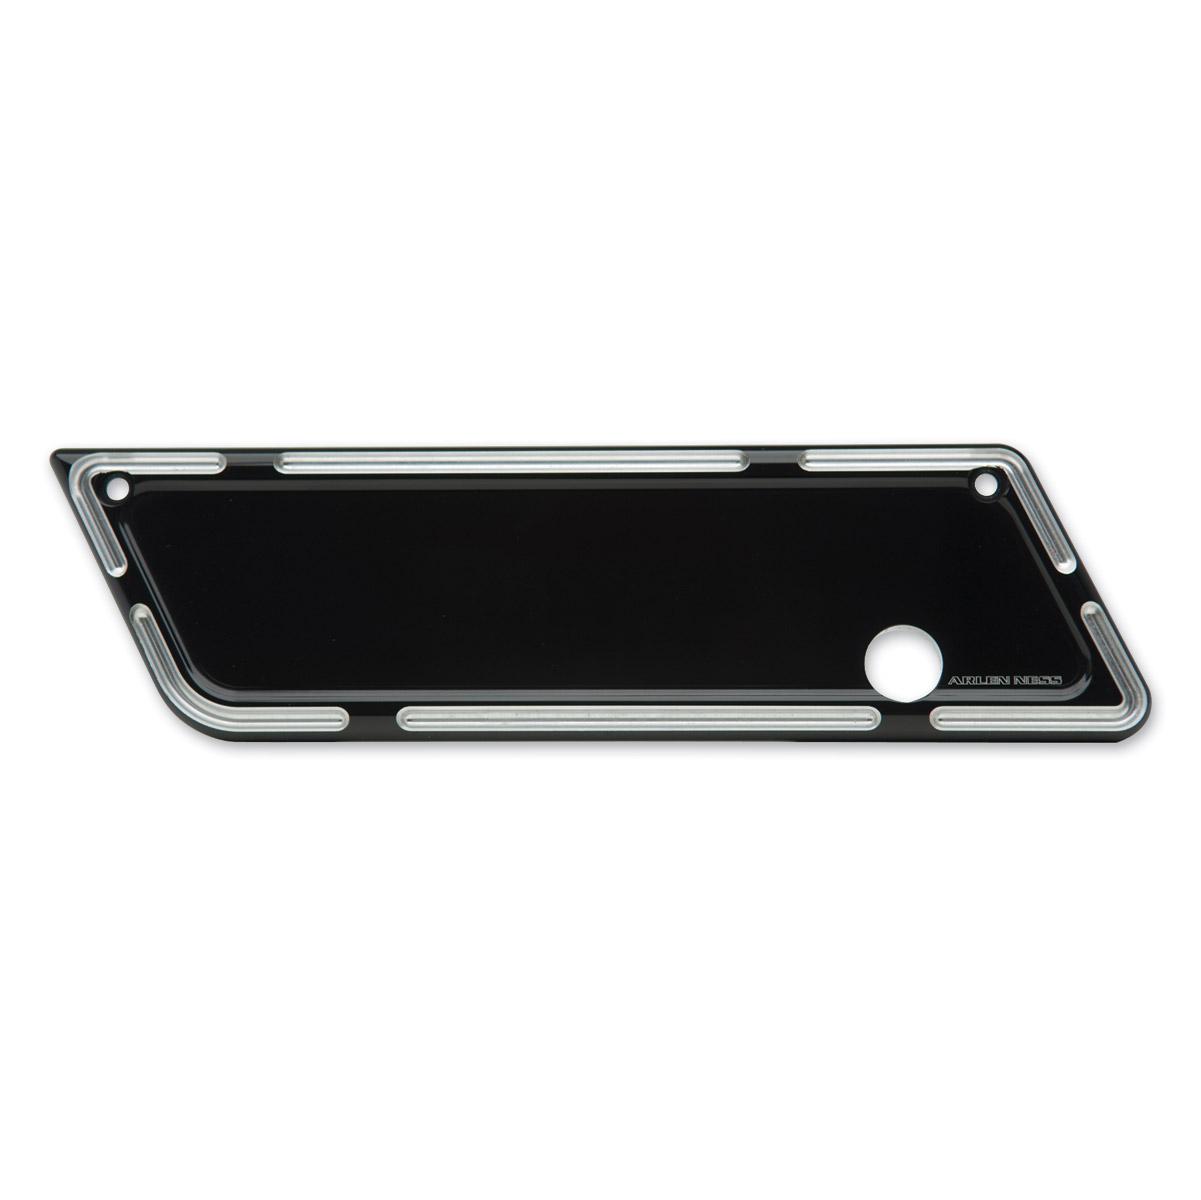 Arlen Ness Slot Track Black Saddlebag Latch Cover